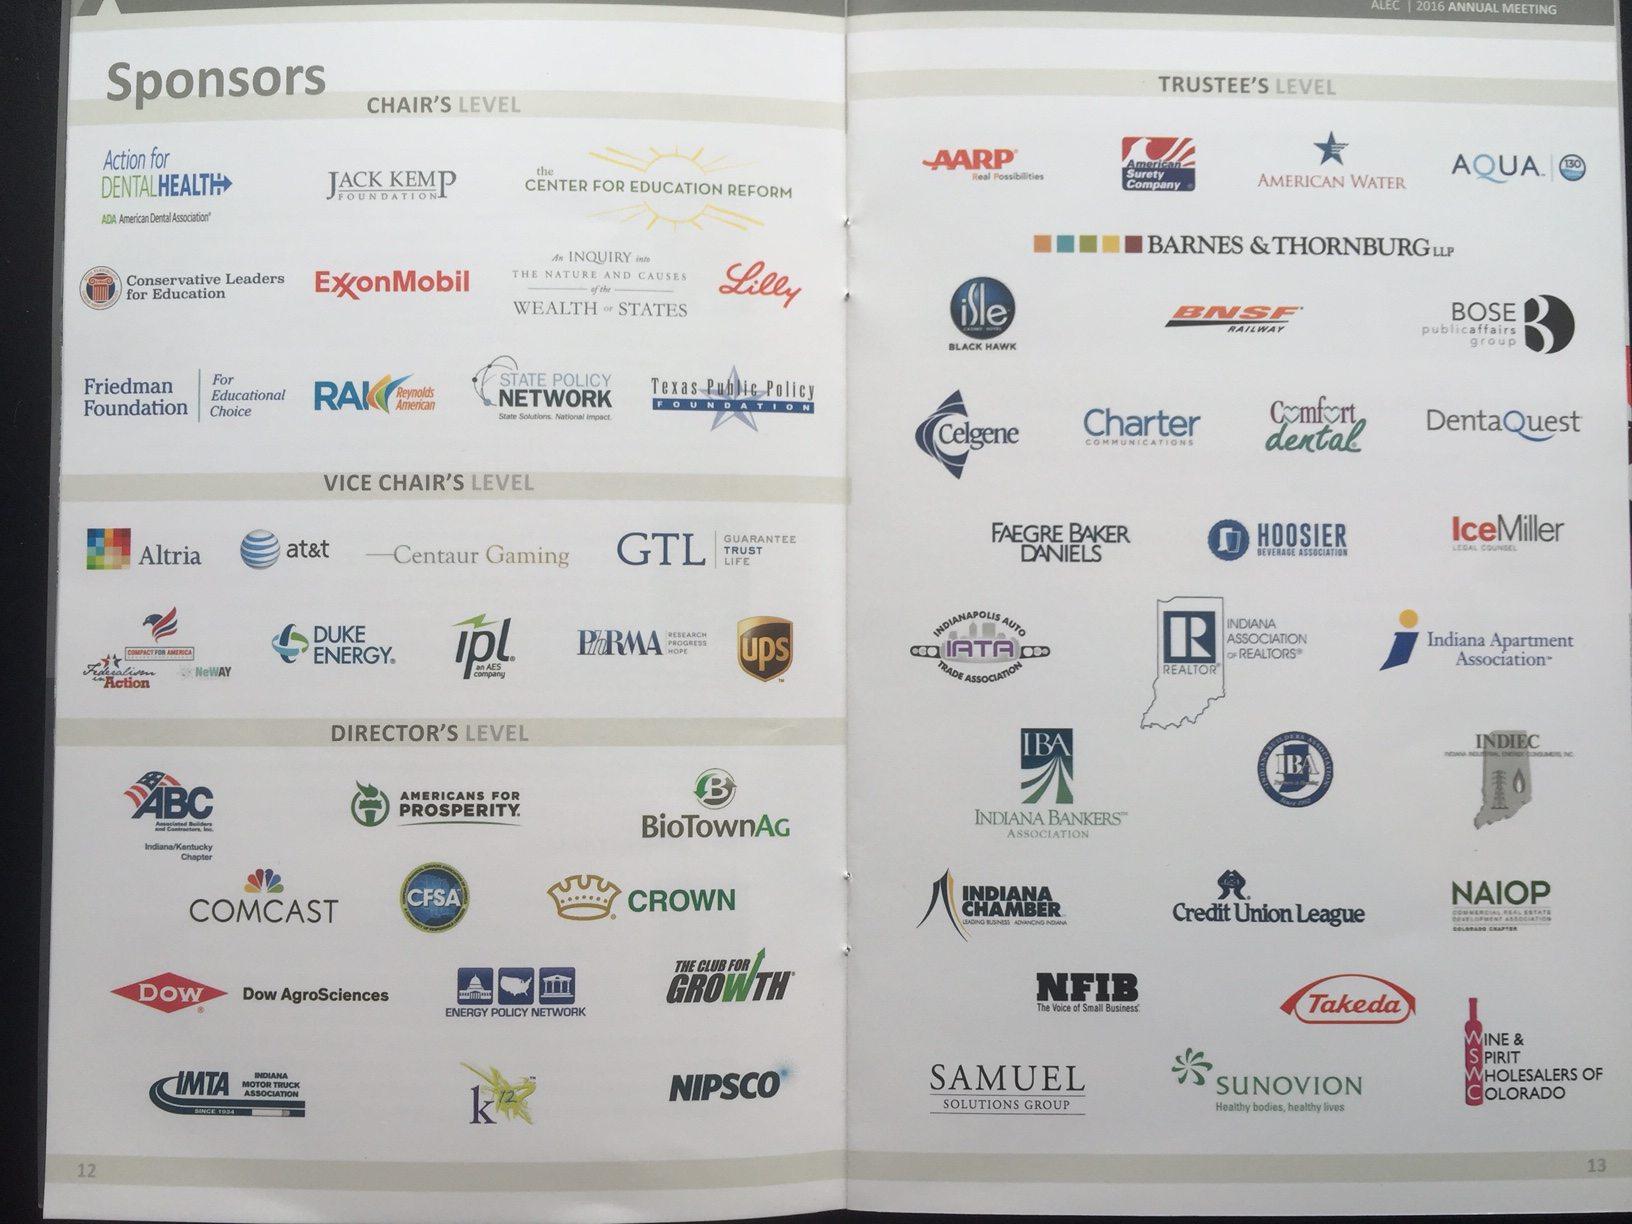 ALEC Indianapolis 2016 sponsors